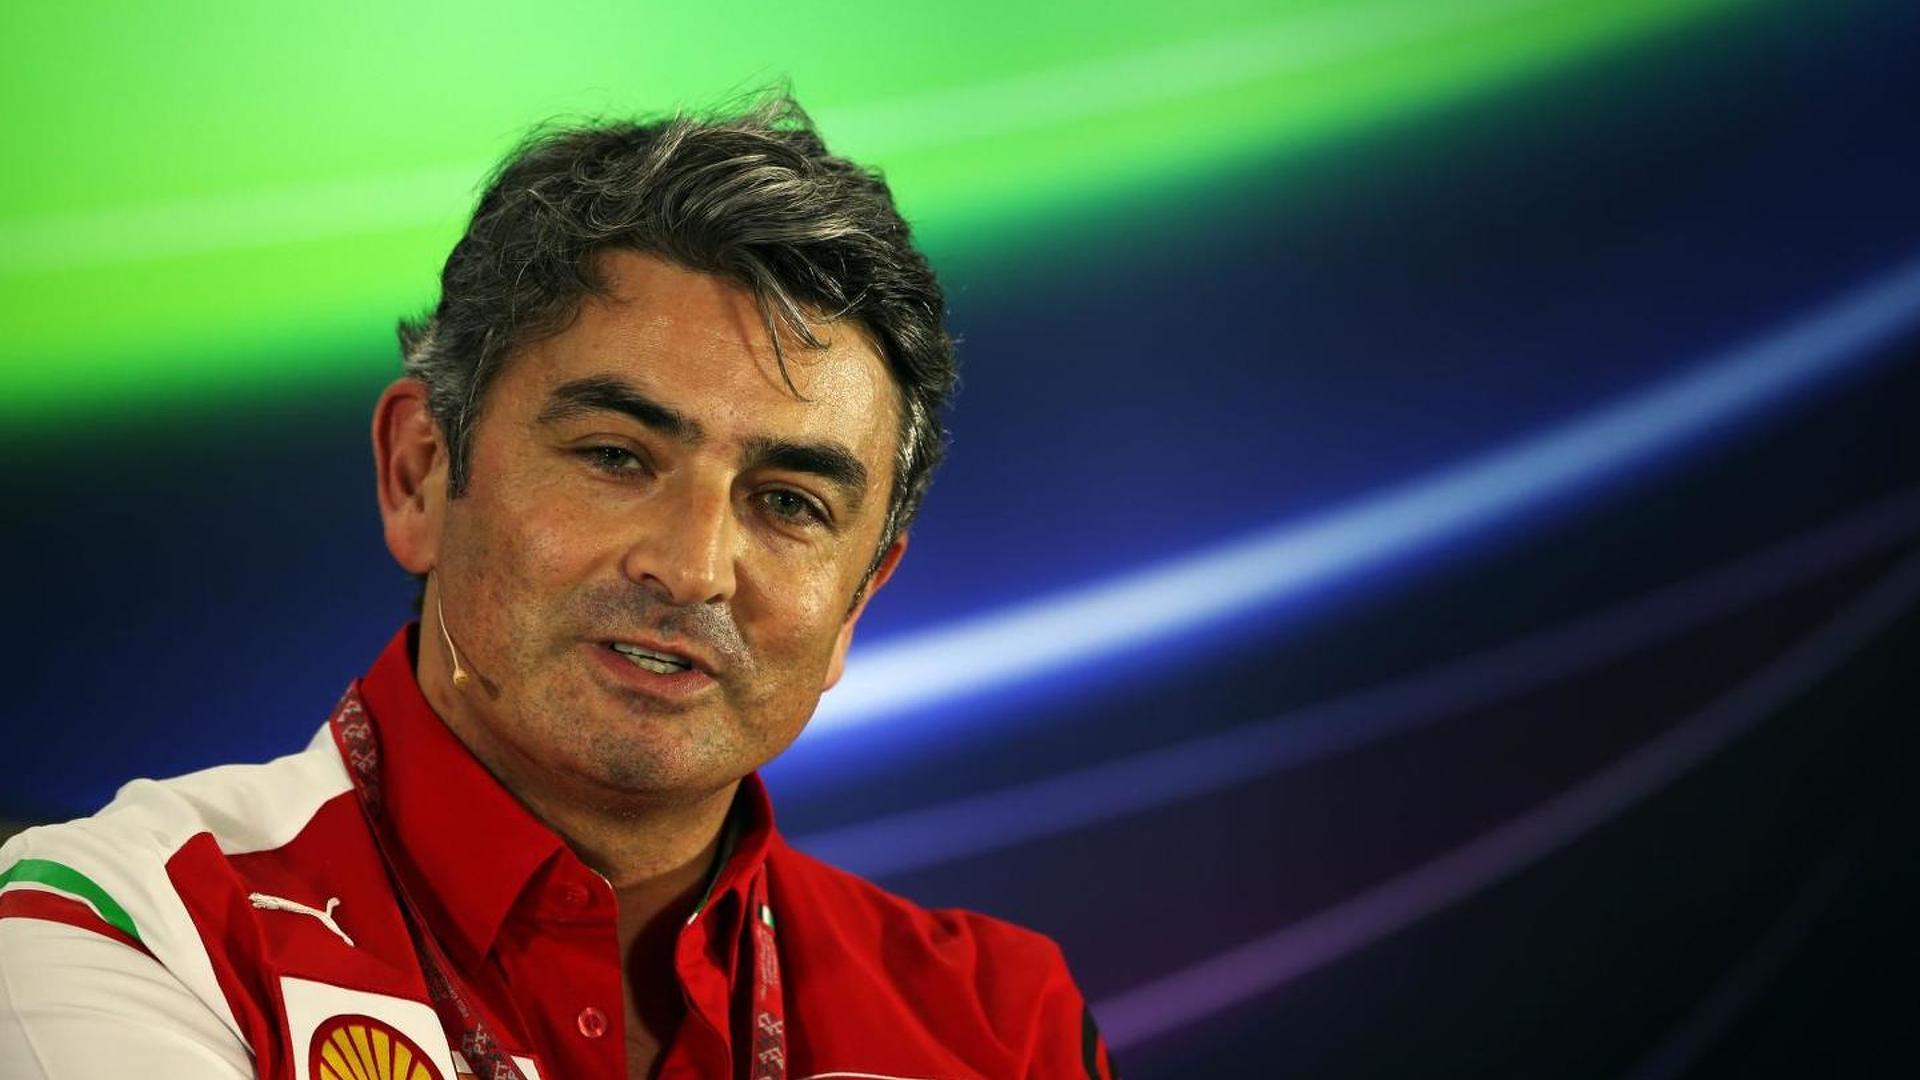 Mattiacci focused on Ferrari top job 'at the moment'